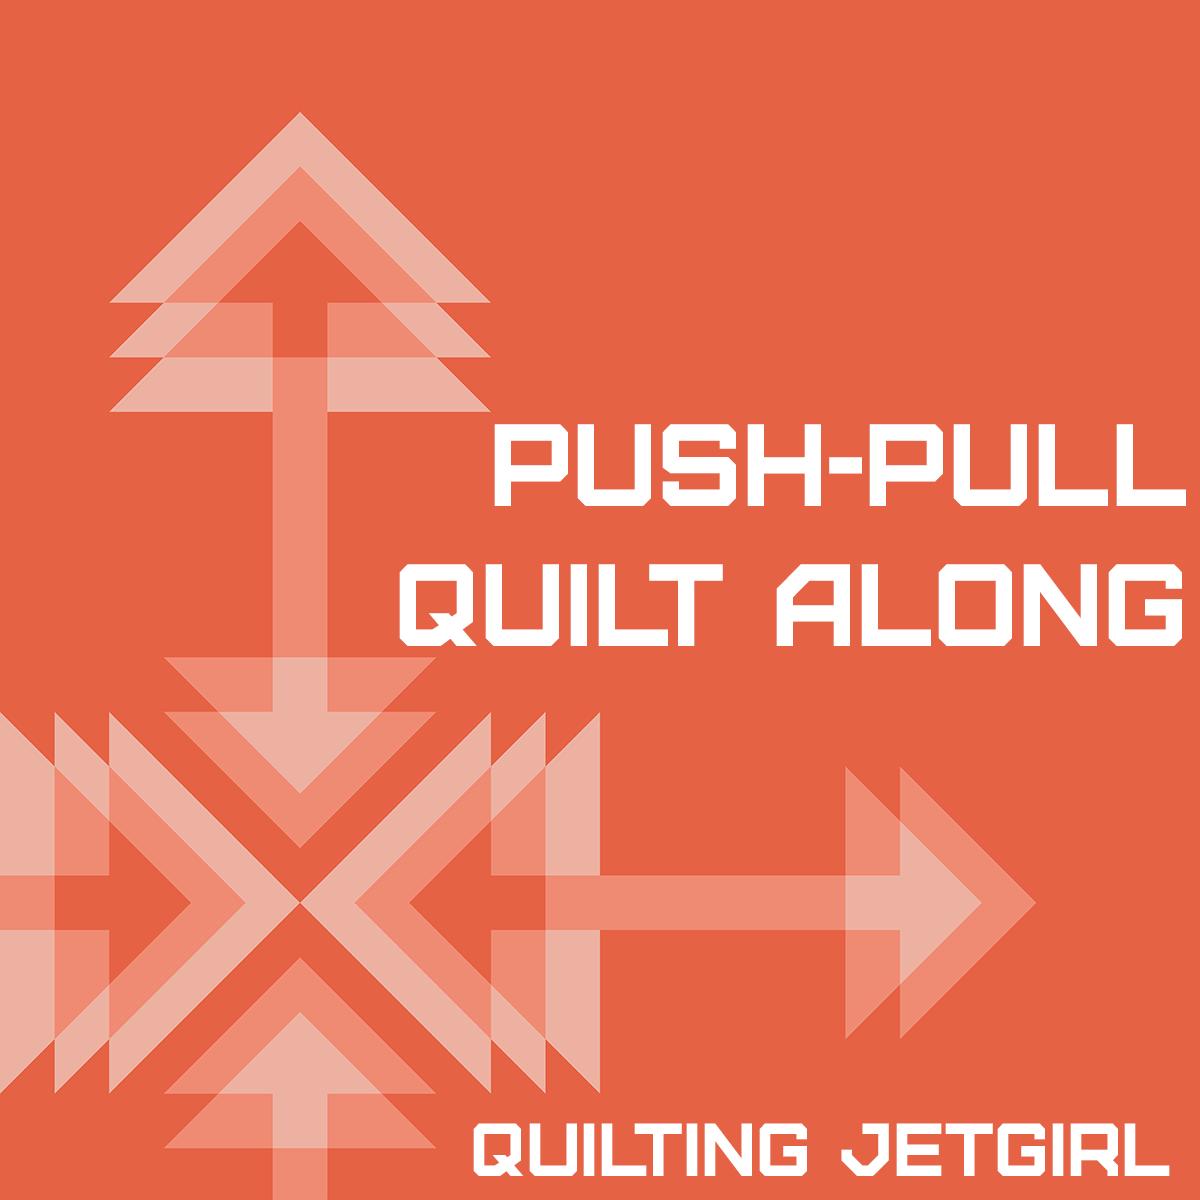 PushPullQuiltAlongButton